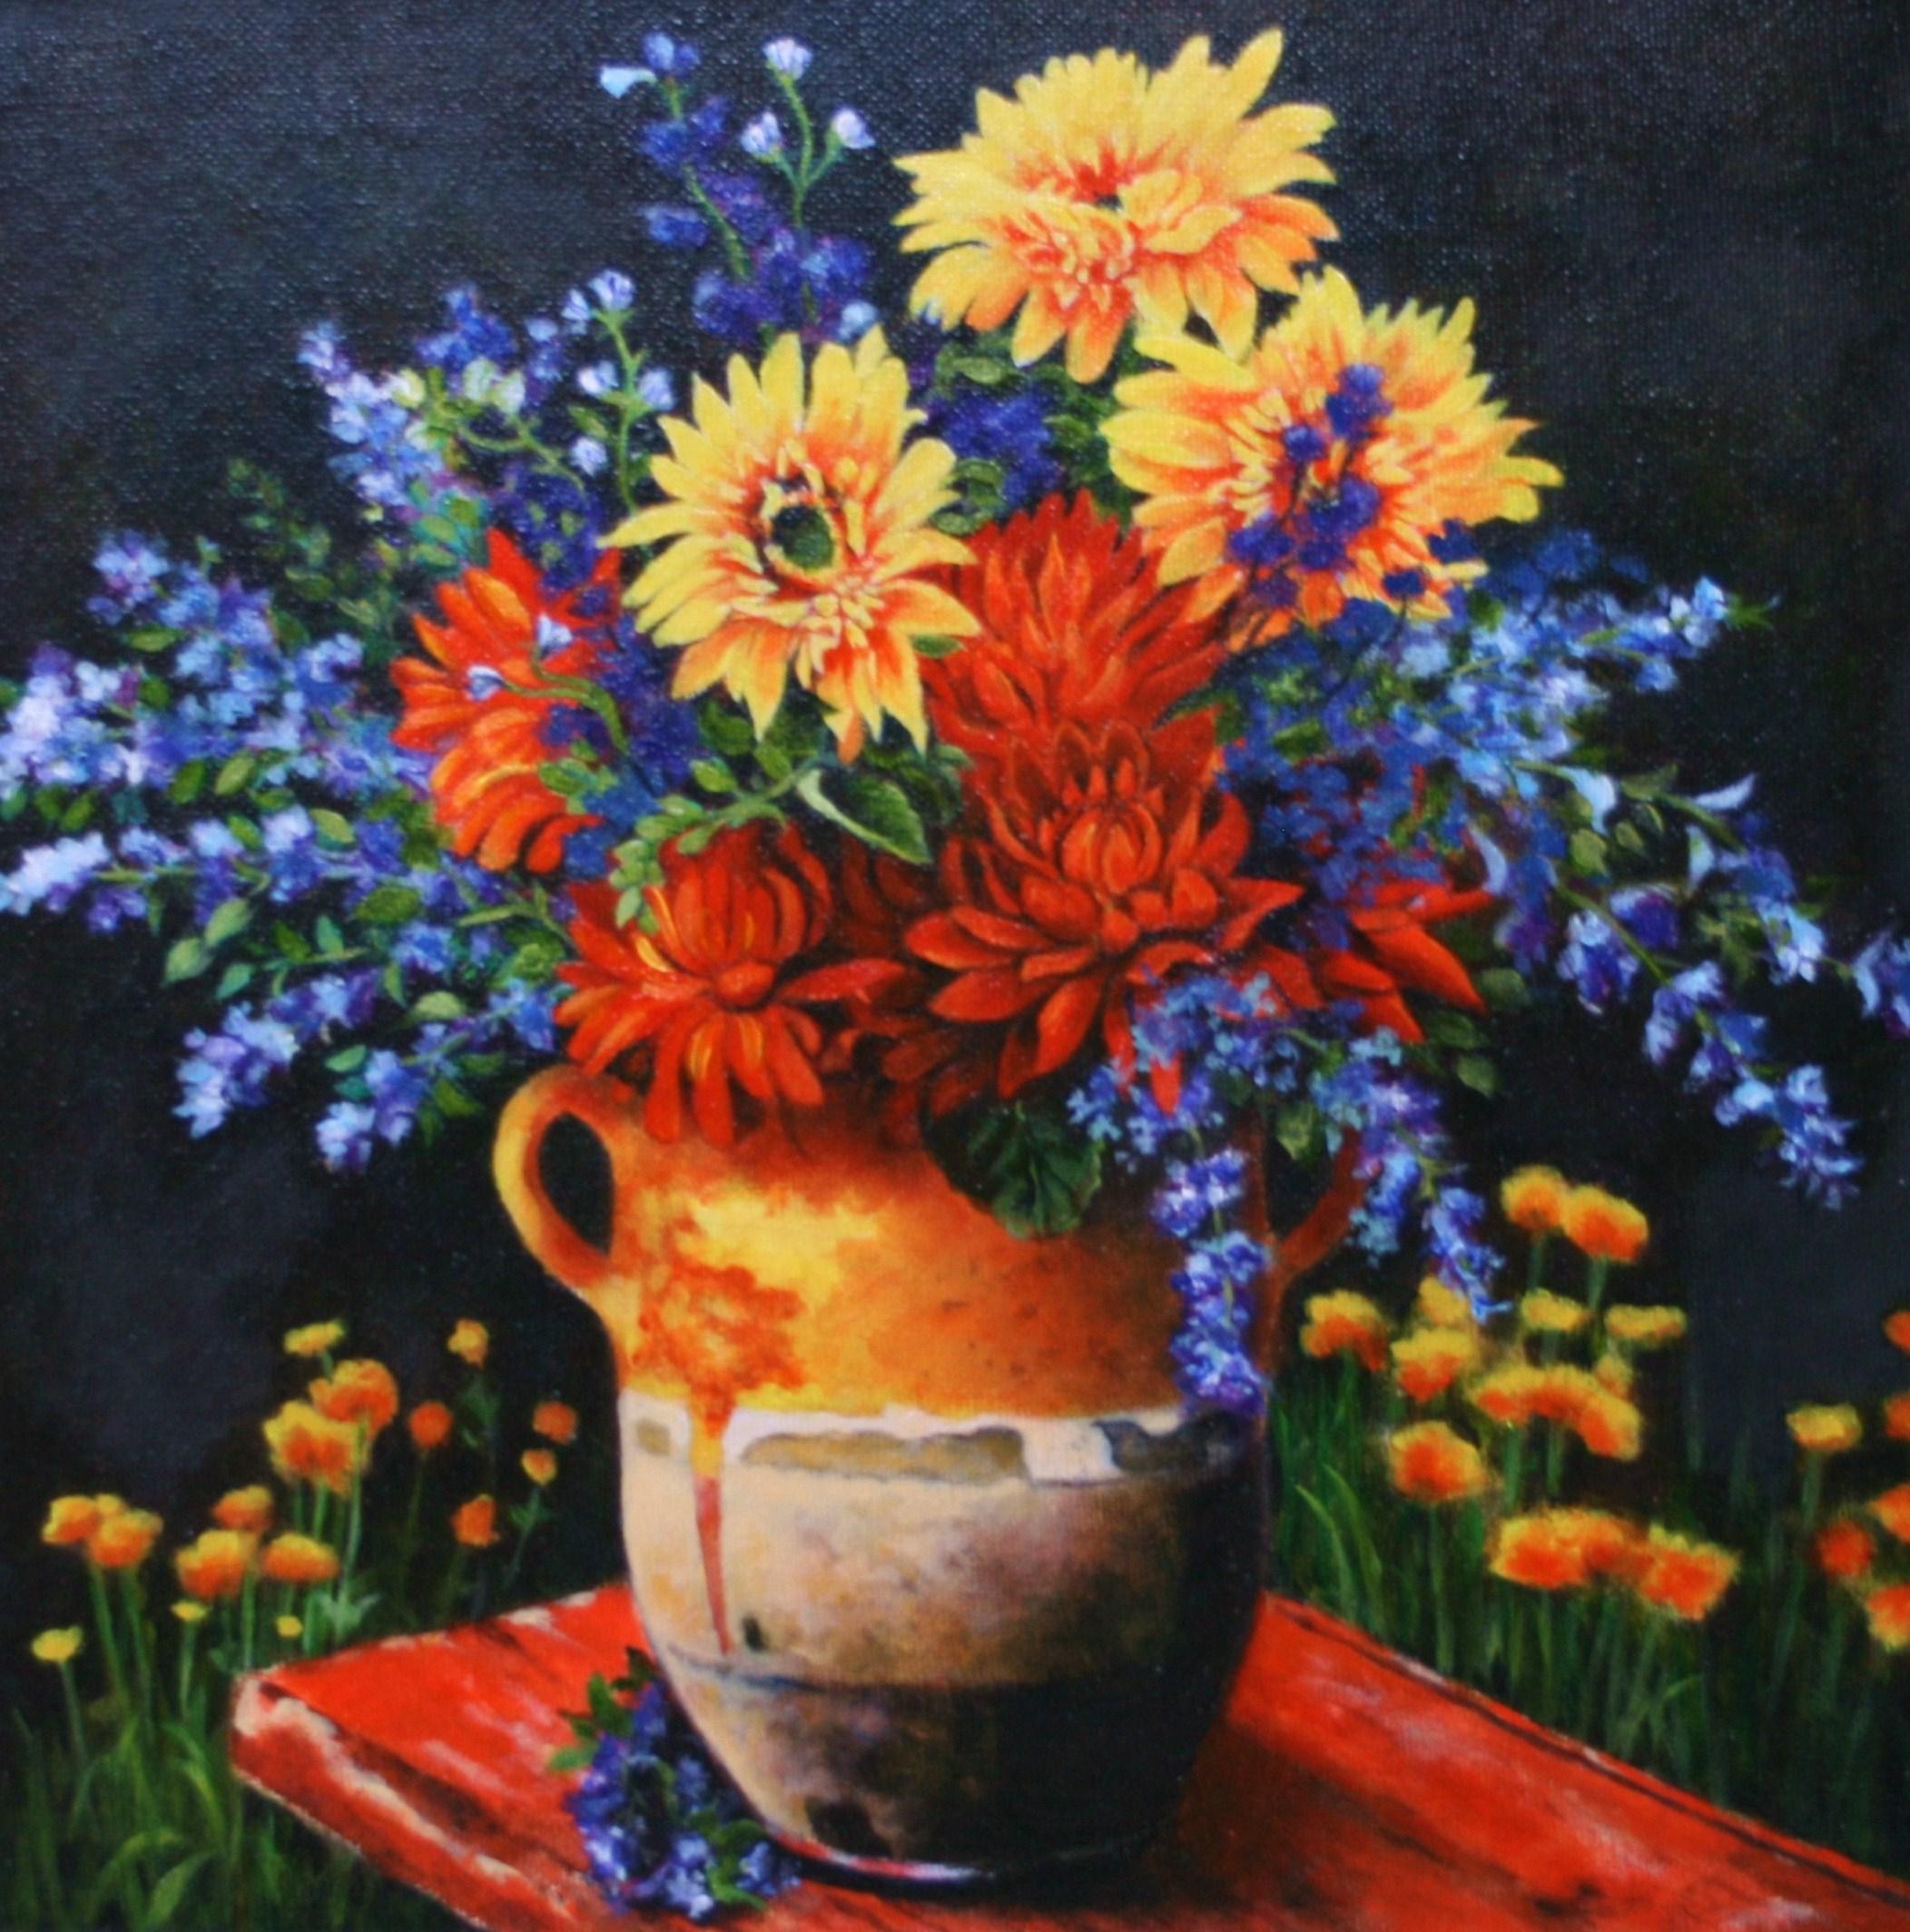 4a85512d13ea9701cc39_garden_flowers_003.JPG